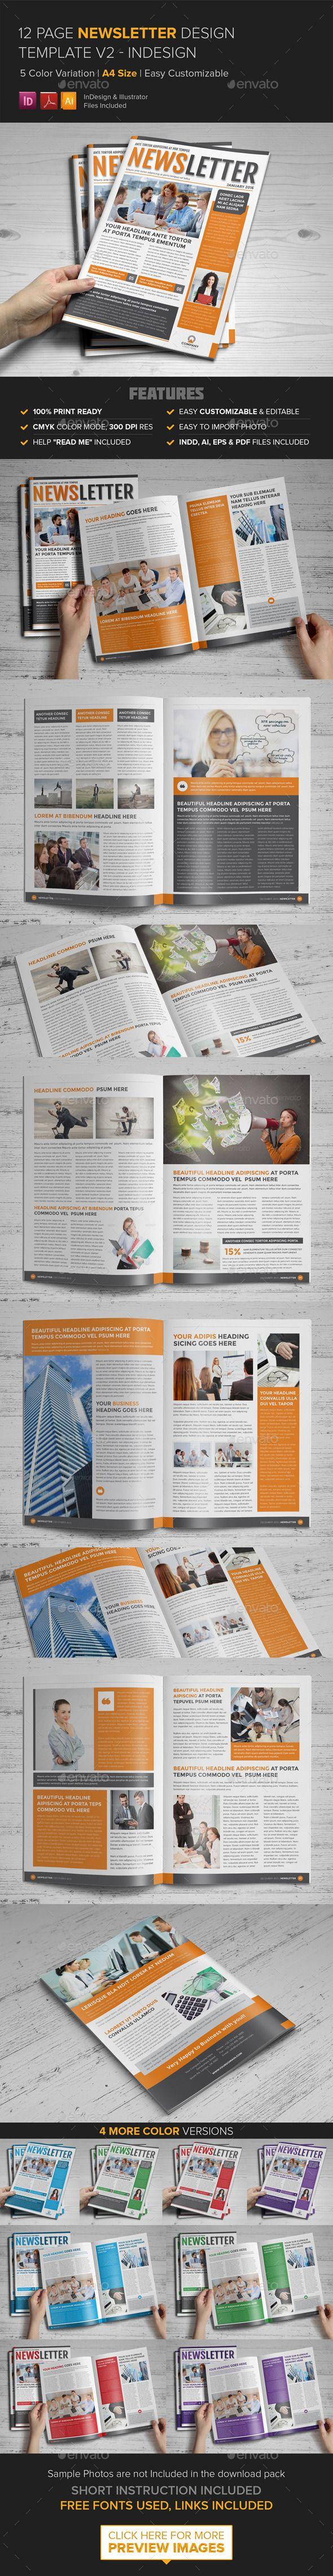 Newsletter Template v2 - InDesign - Newsletters Print Templates